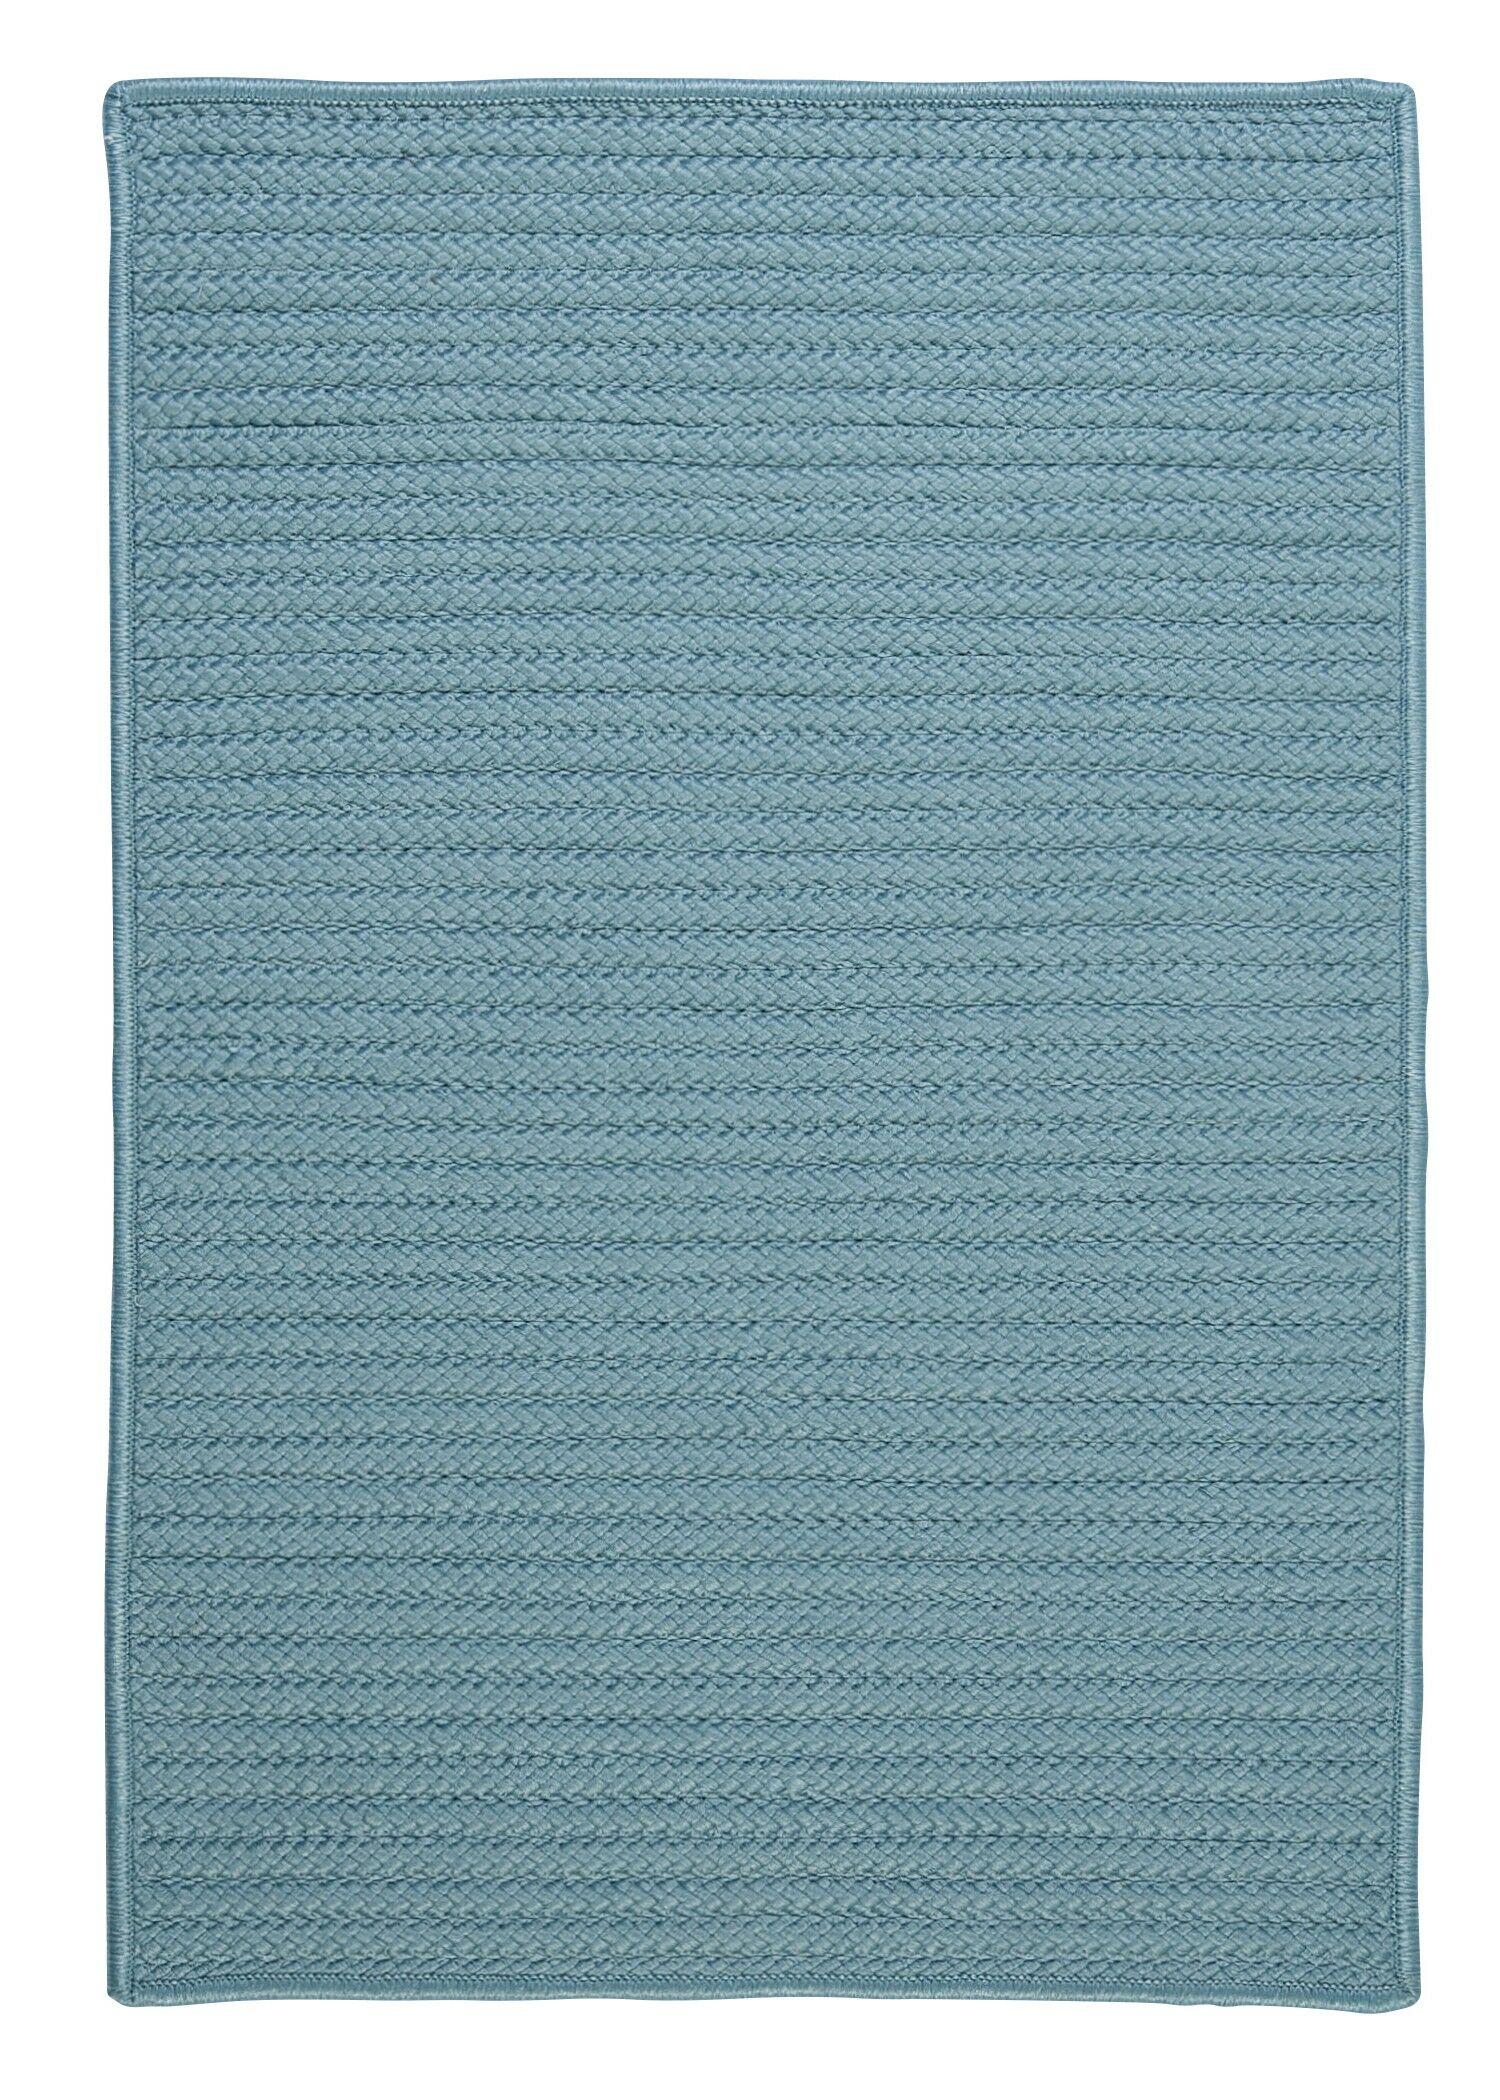 Raulston Blue Indoor/Outdoor Area Rug Rug Size: Rectangle 5' x 8'